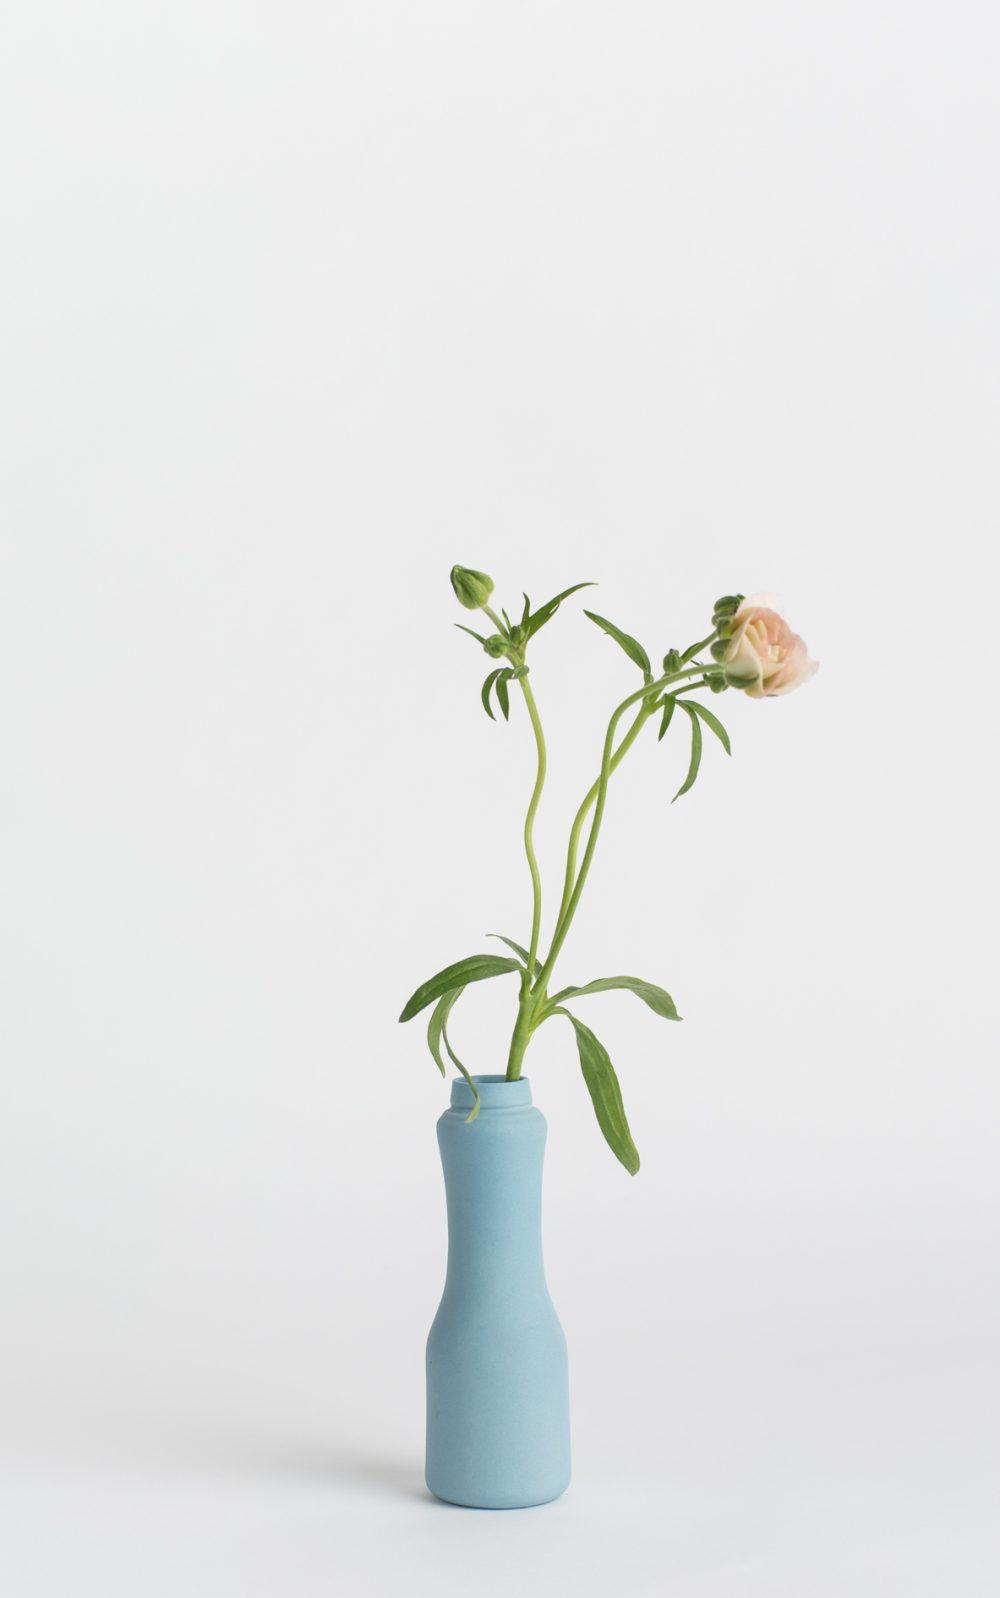 bottle vase #6 dark blue with flower